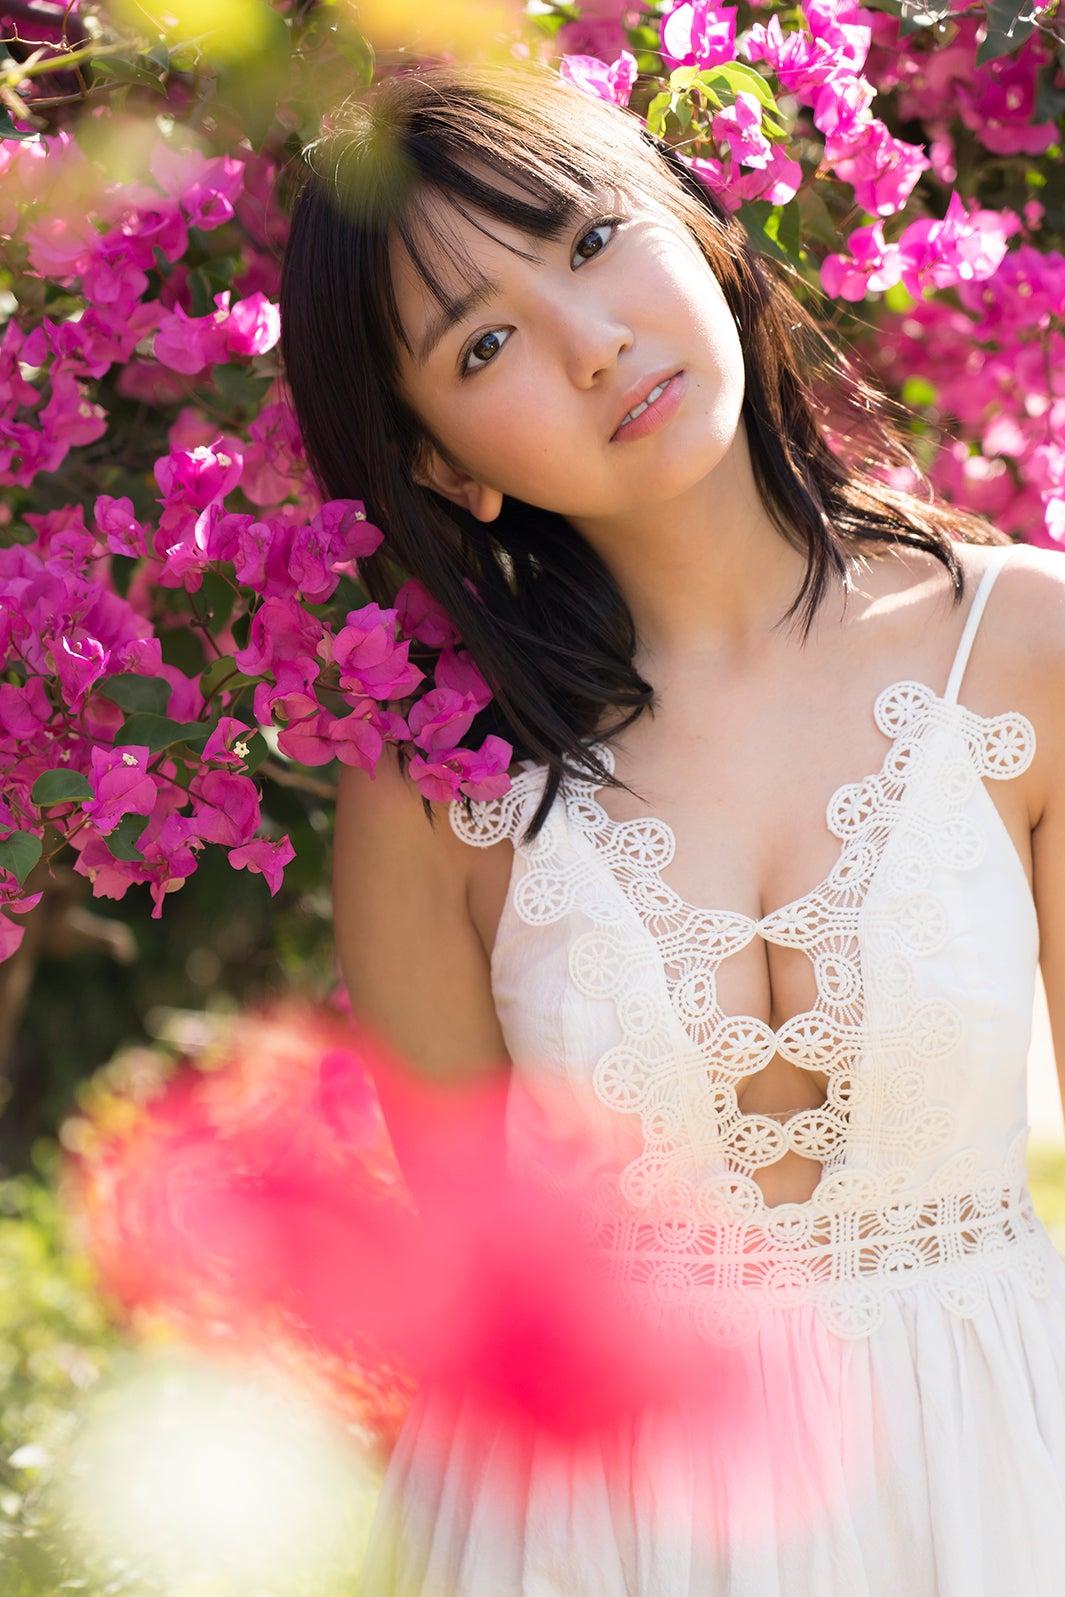 Aika 黒人 2019年02月: strawberryチャンネル